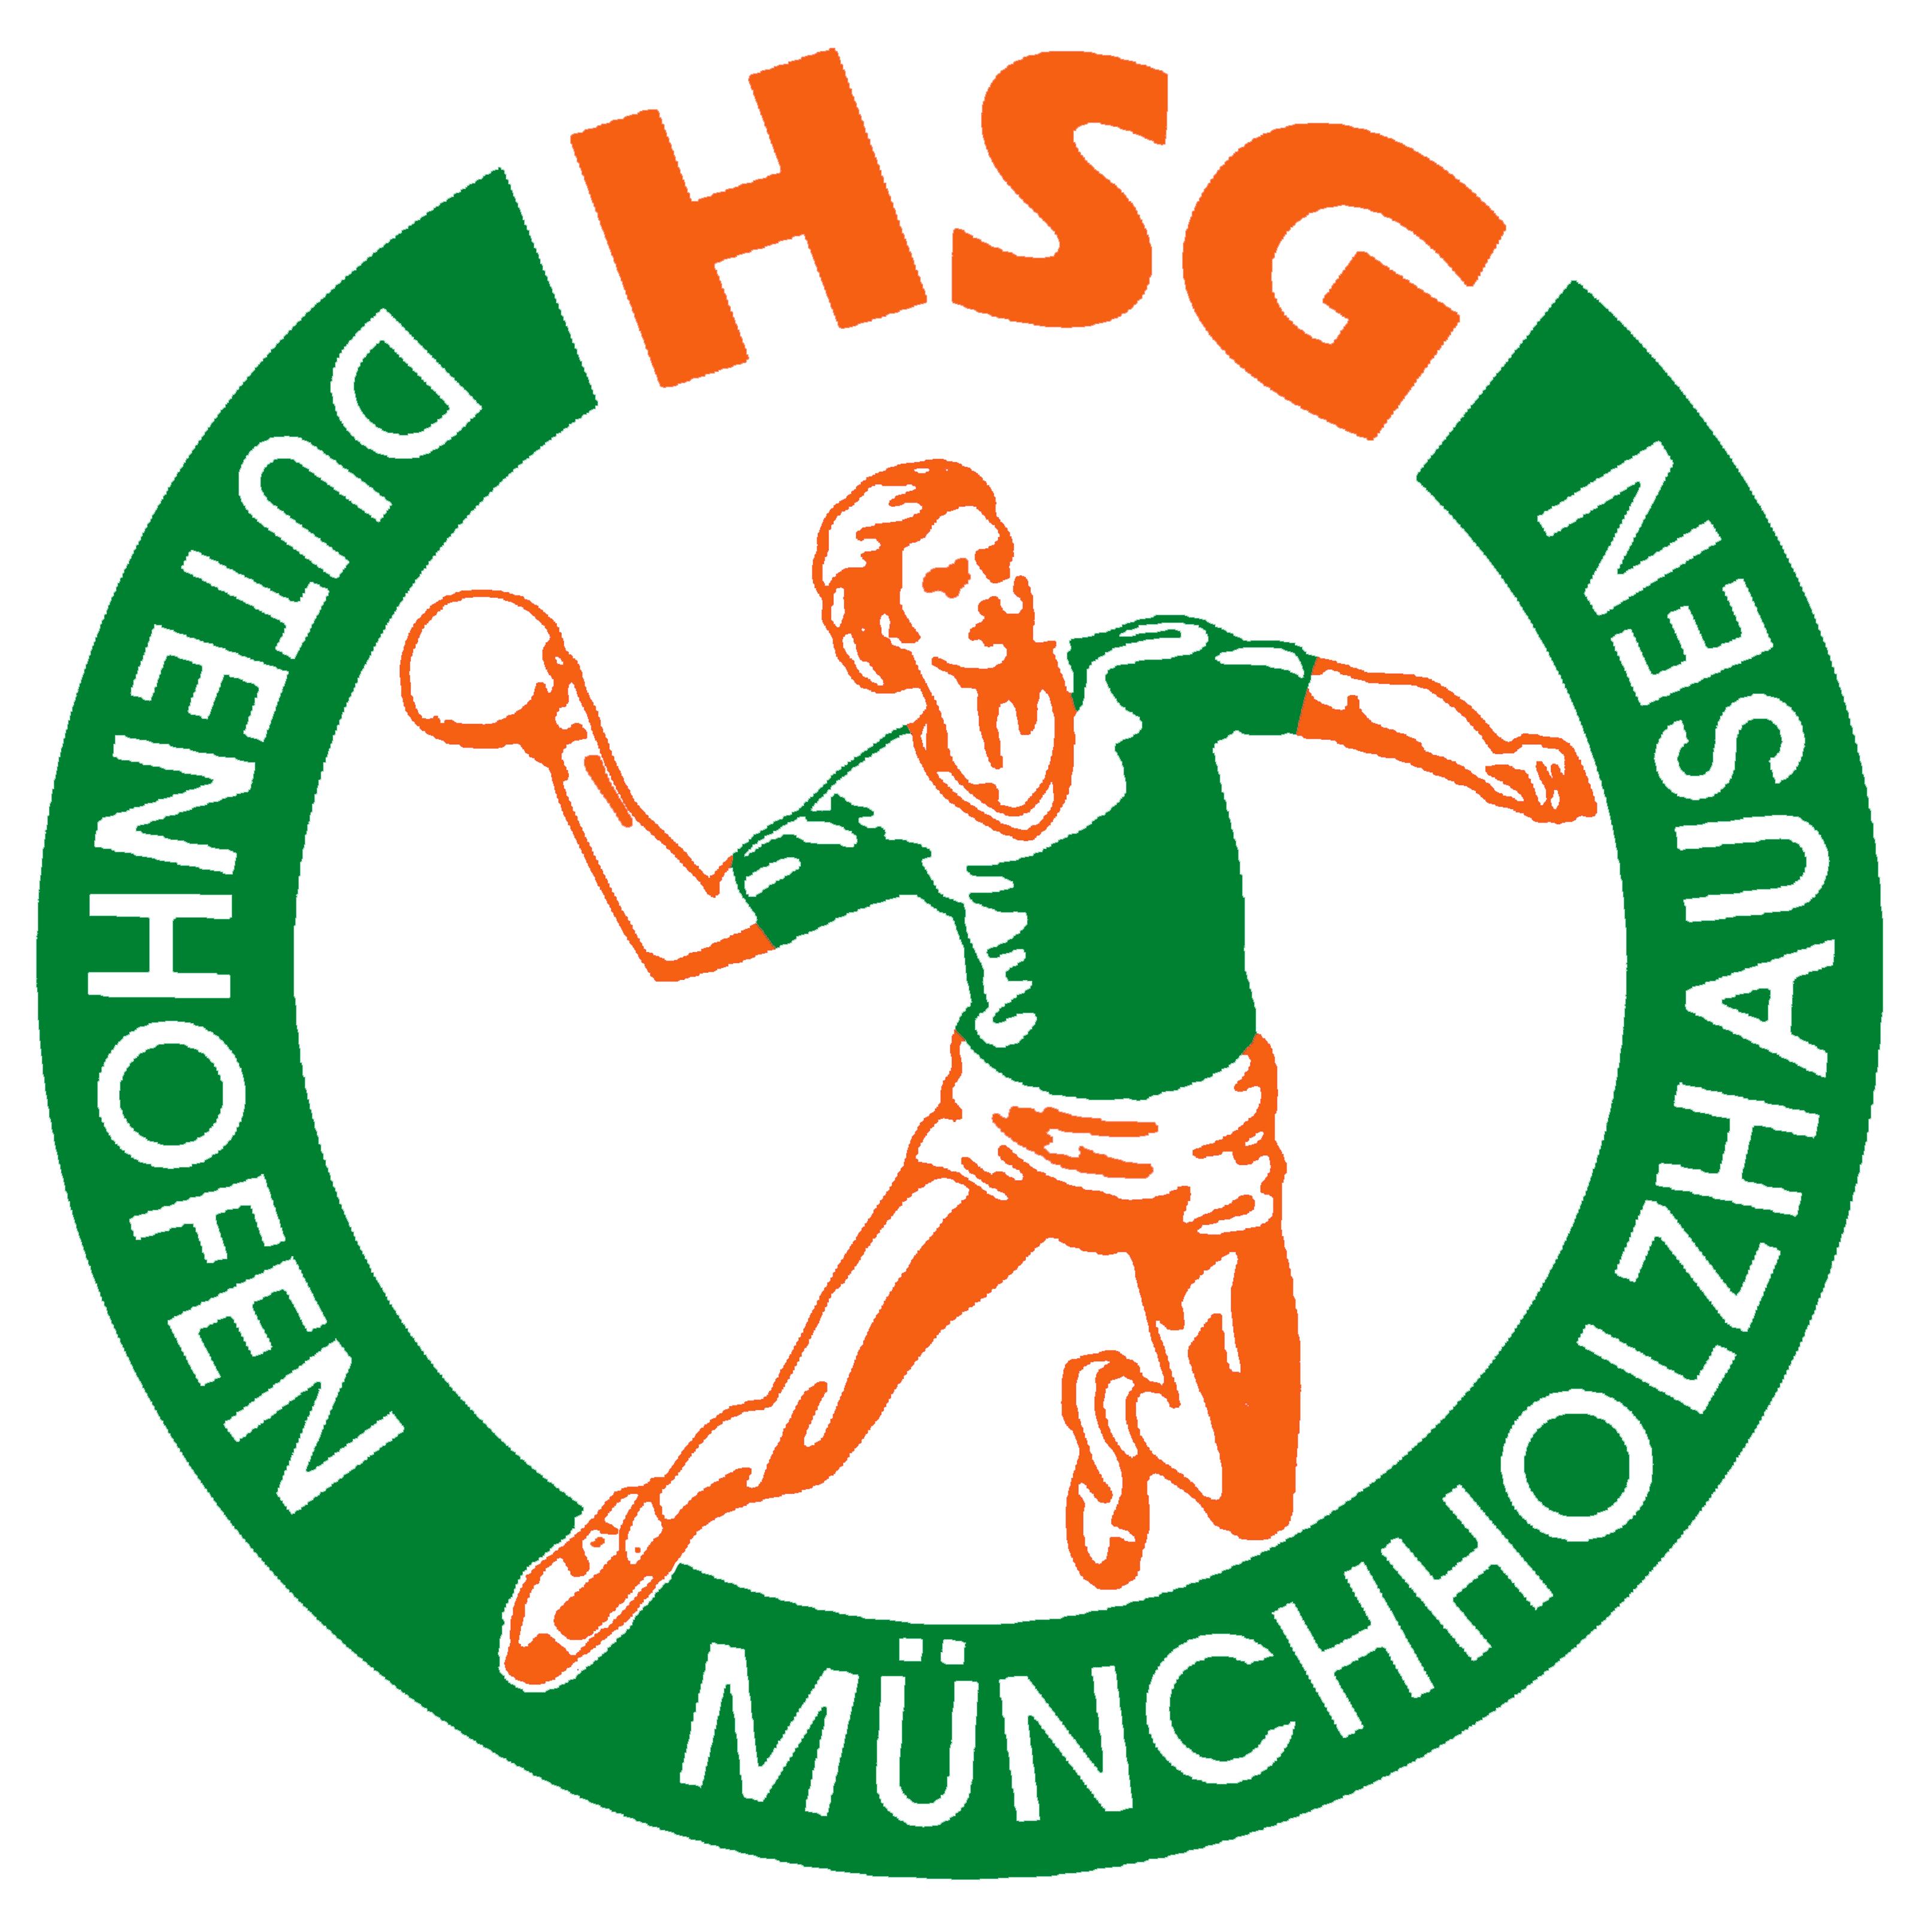 HSG Dutenhofen/Münchholzhausen